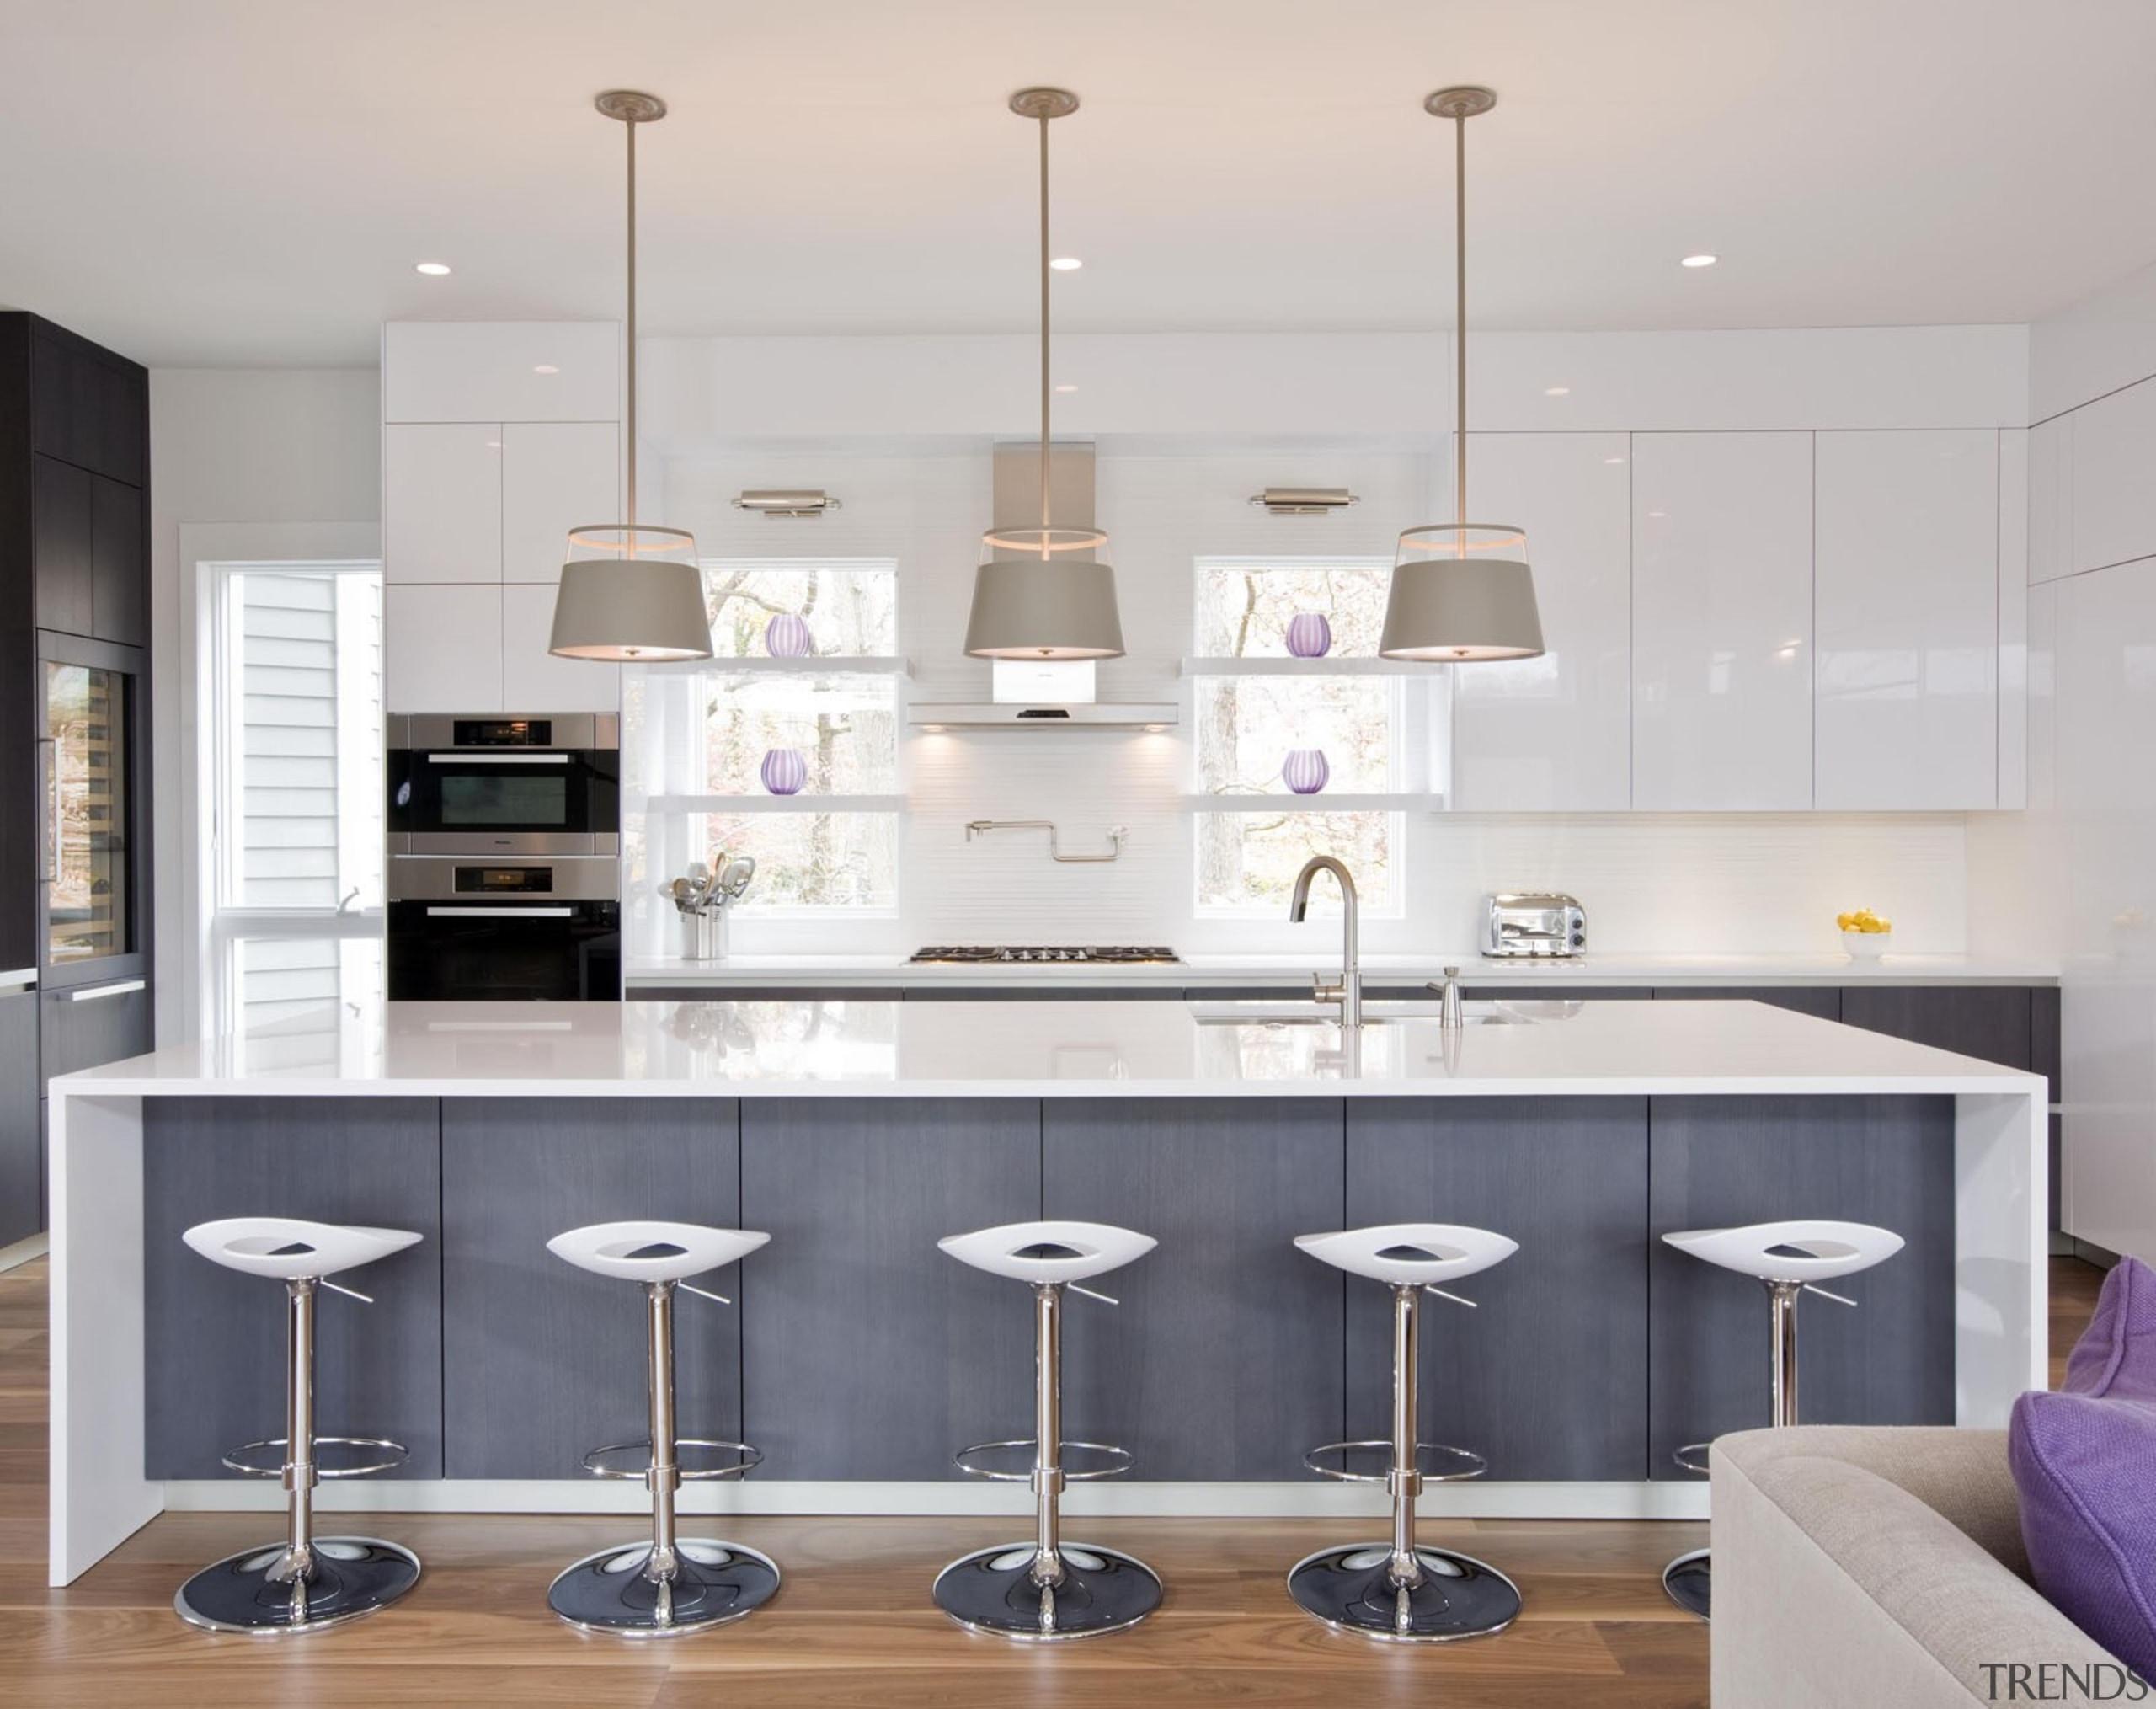 Erin Pitts - Blanco Zeus Extreme - Erin cabinetry, countertop, cuisine classique, interior design, kitchen, product design, gray